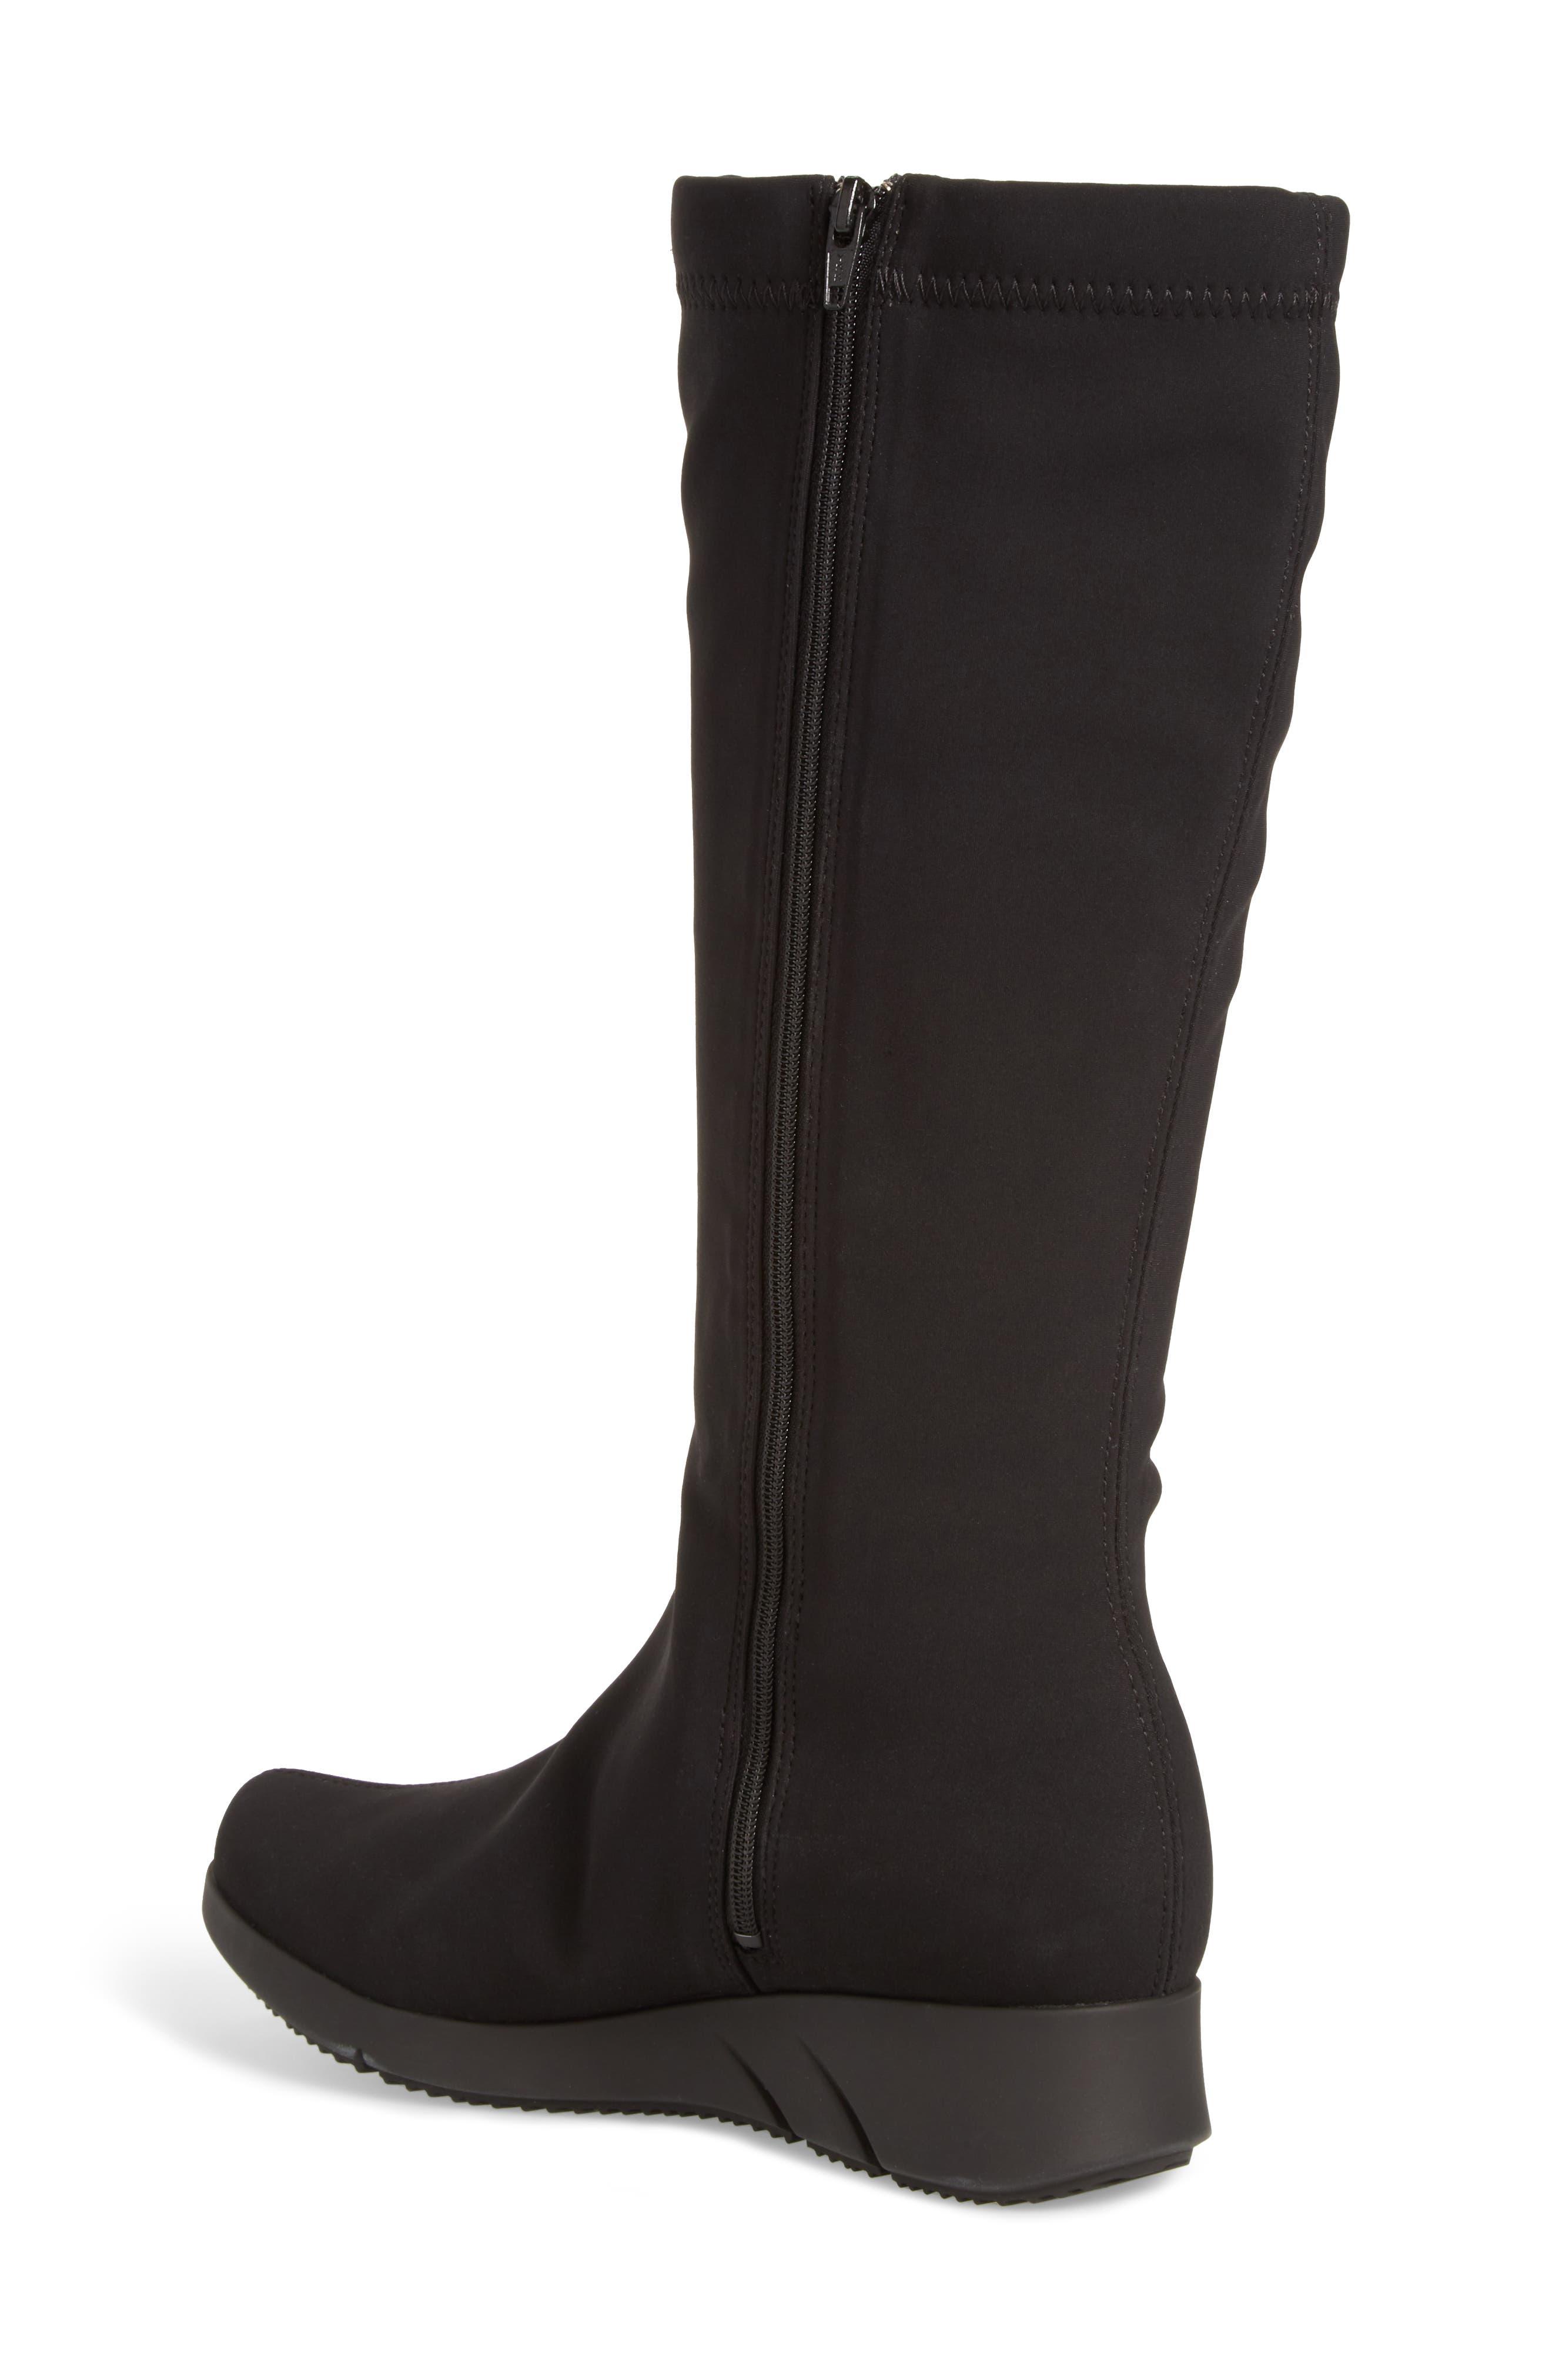 Minda Waterproof Wedge Boot,                             Alternate thumbnail 2, color,                             Black Fabric